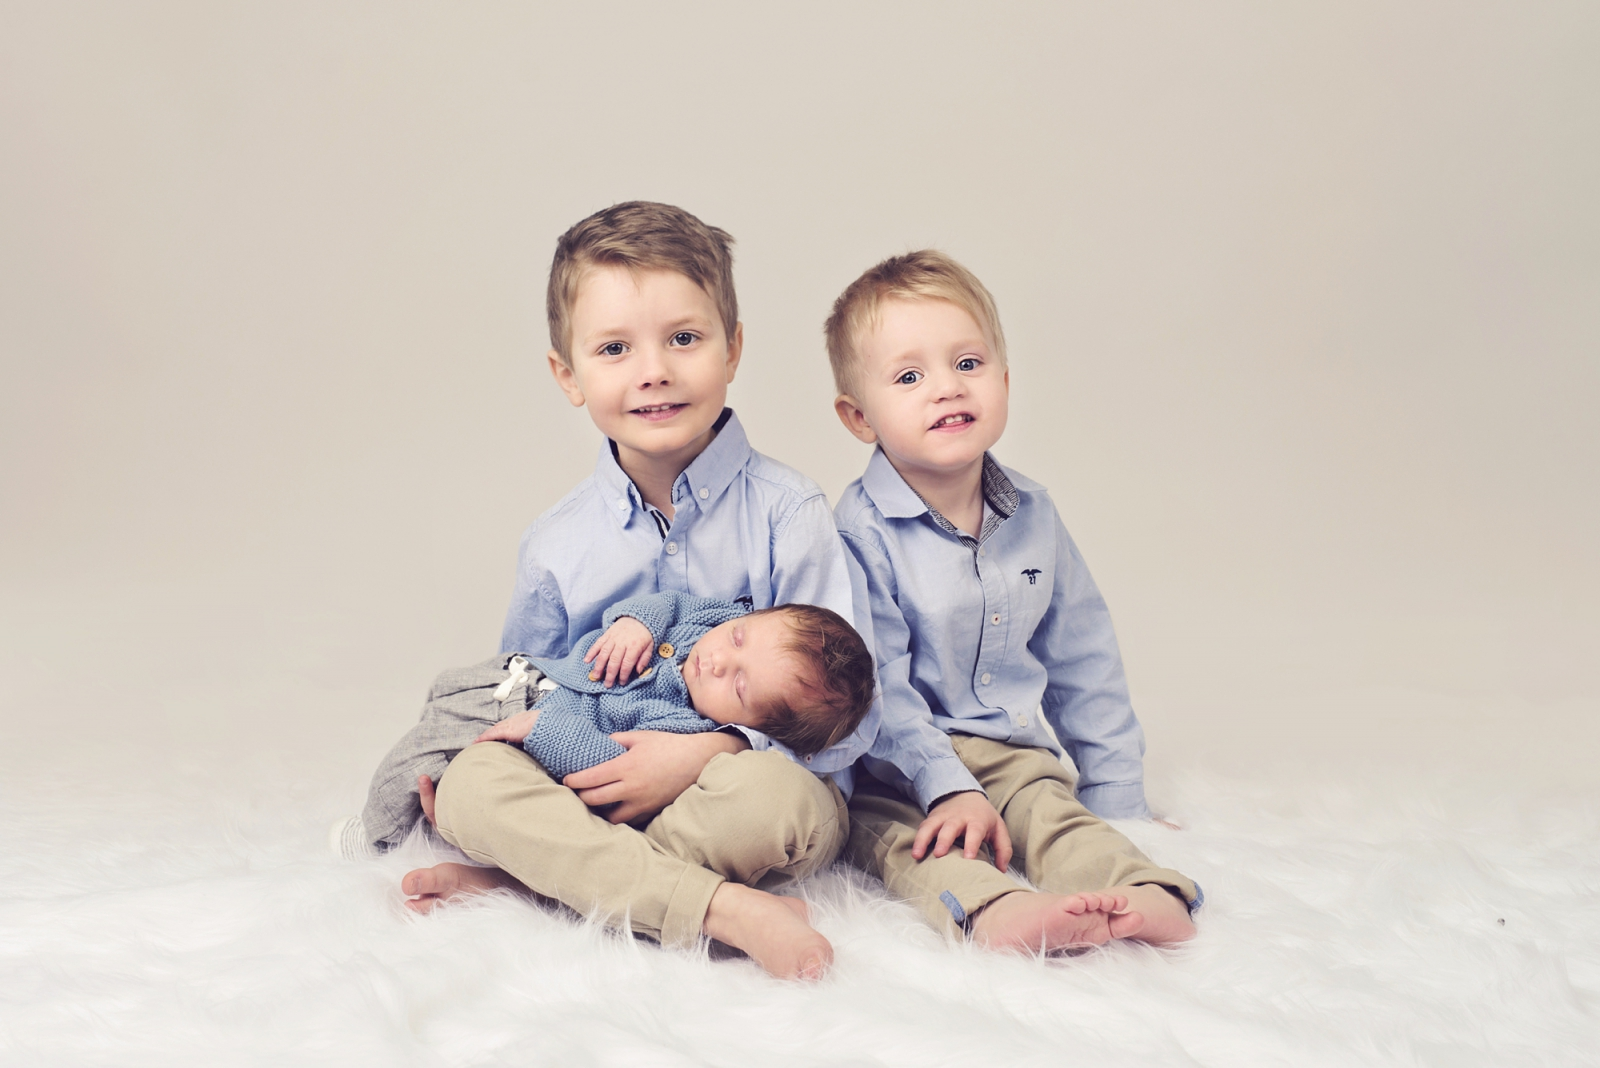 bebisfotografering bebisfoto fotograf umeå newborn